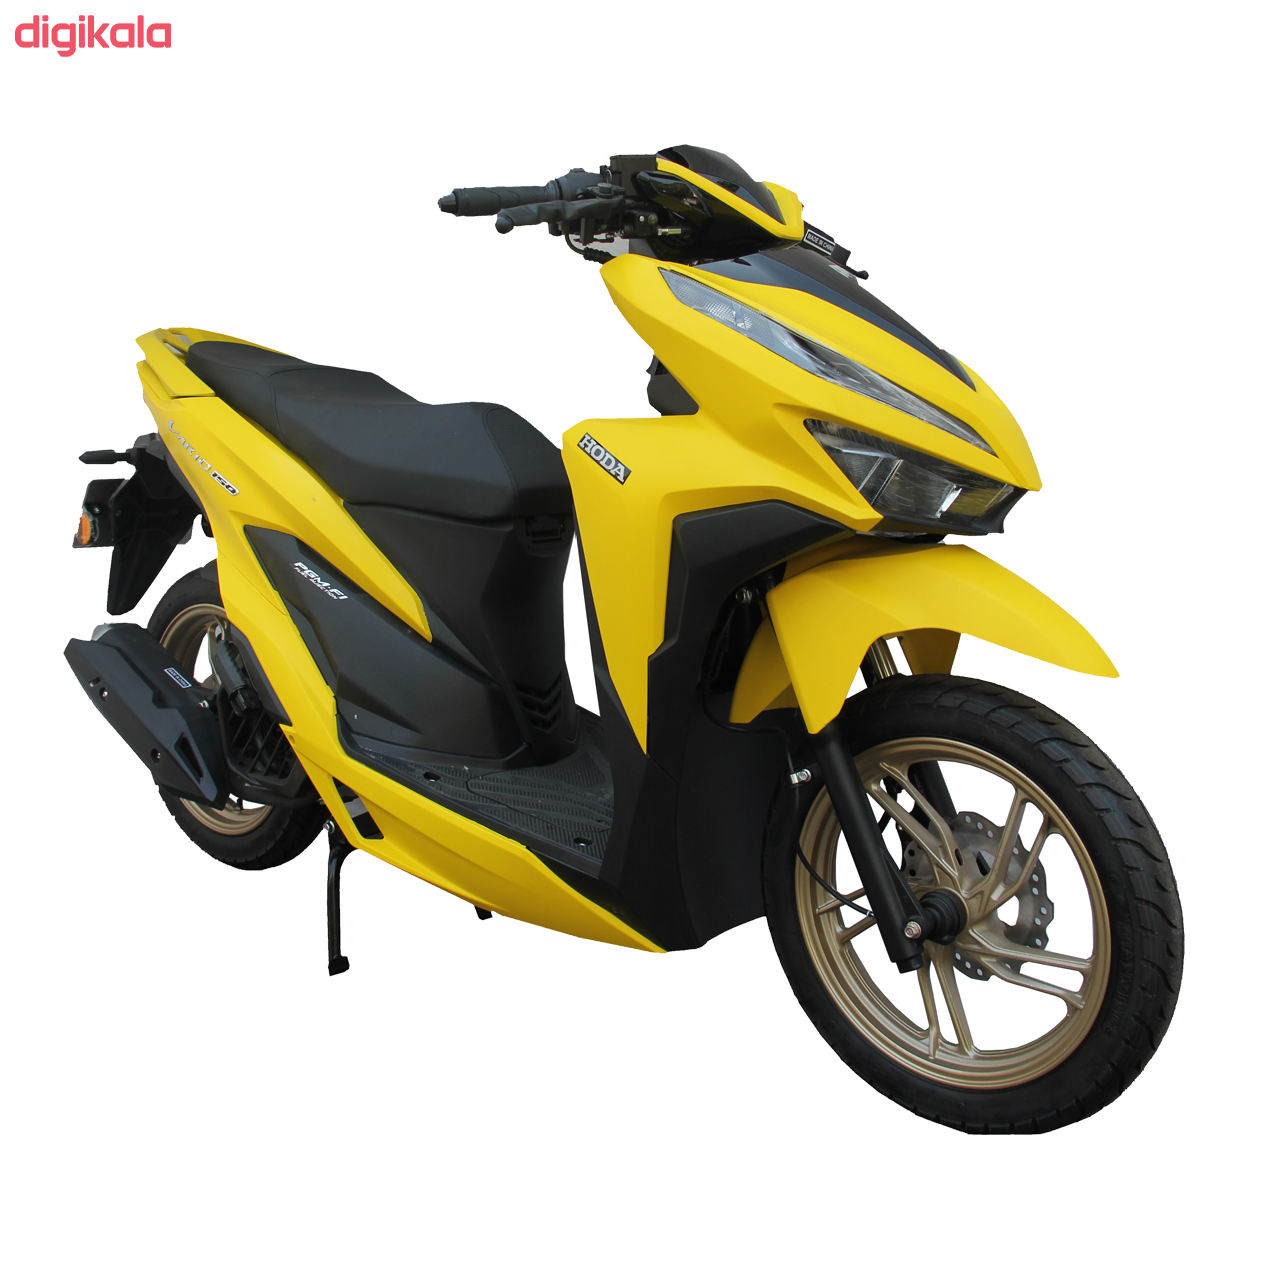 موتورسیکلت کلیک مدل هدا 150 سی سی سال 1399 main 1 2